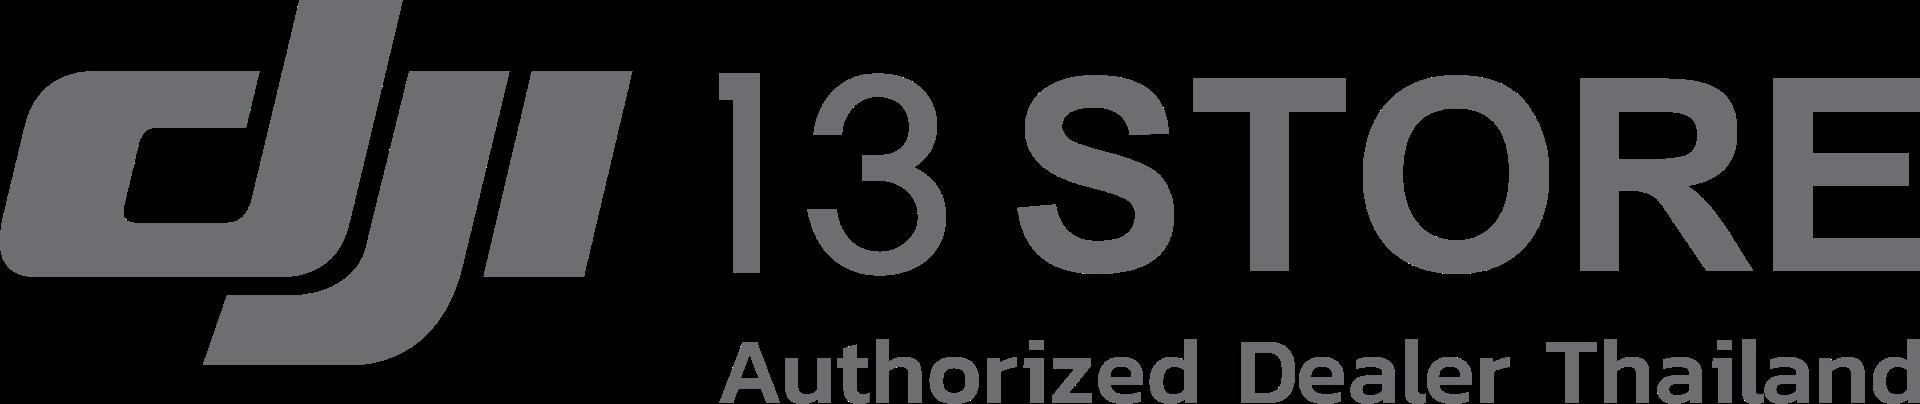 dji13store_logo